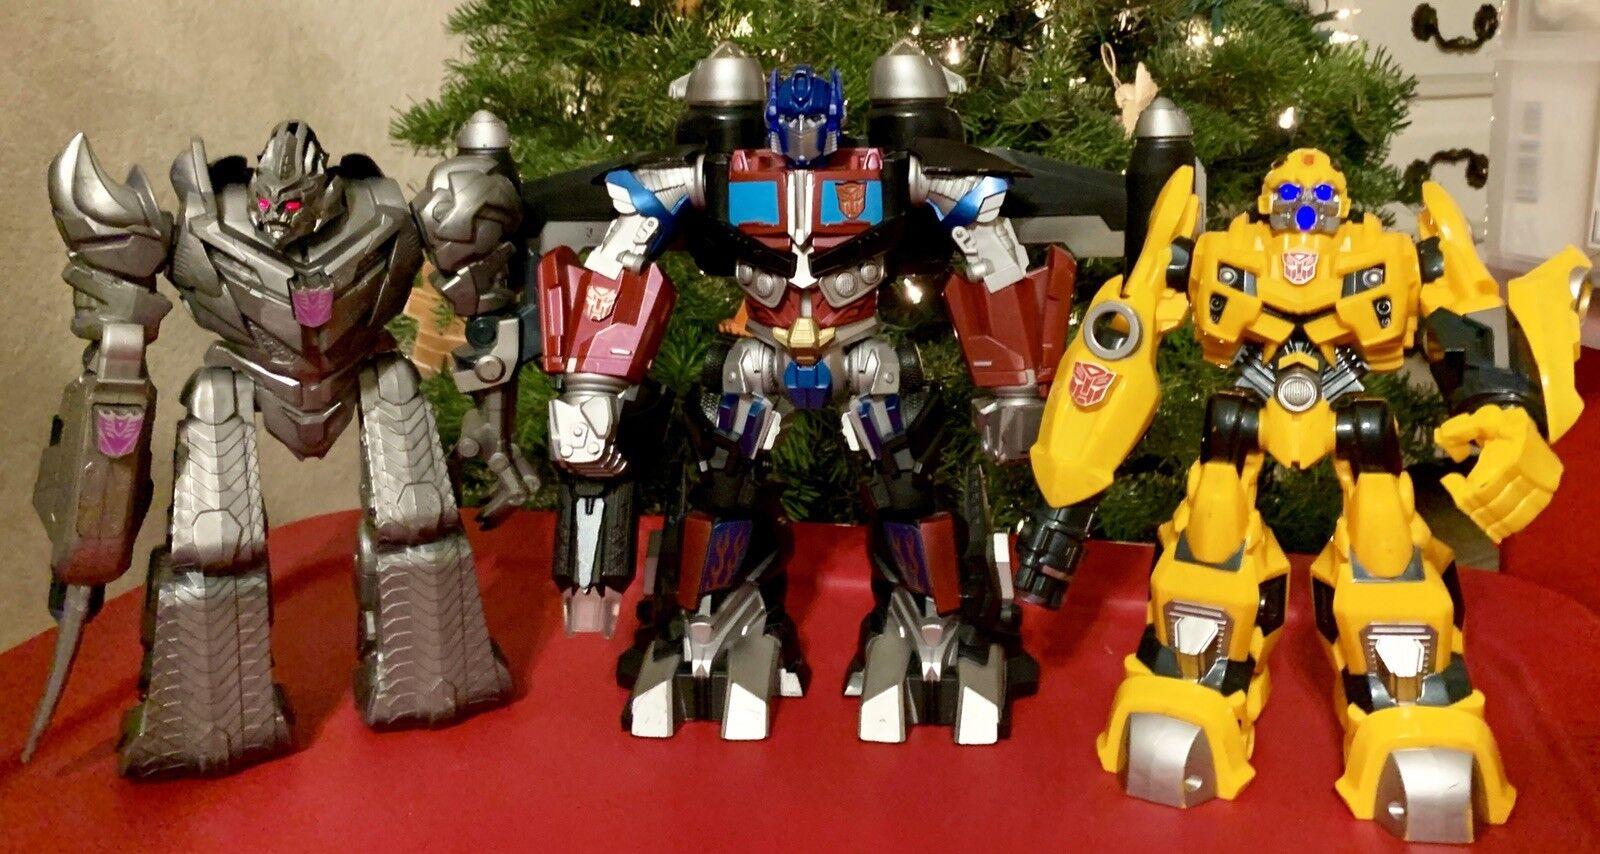 Transformers BUMBLEBEE MEGATRON OPTIMUS PRIME Lot Talking Action Figures 2008 09